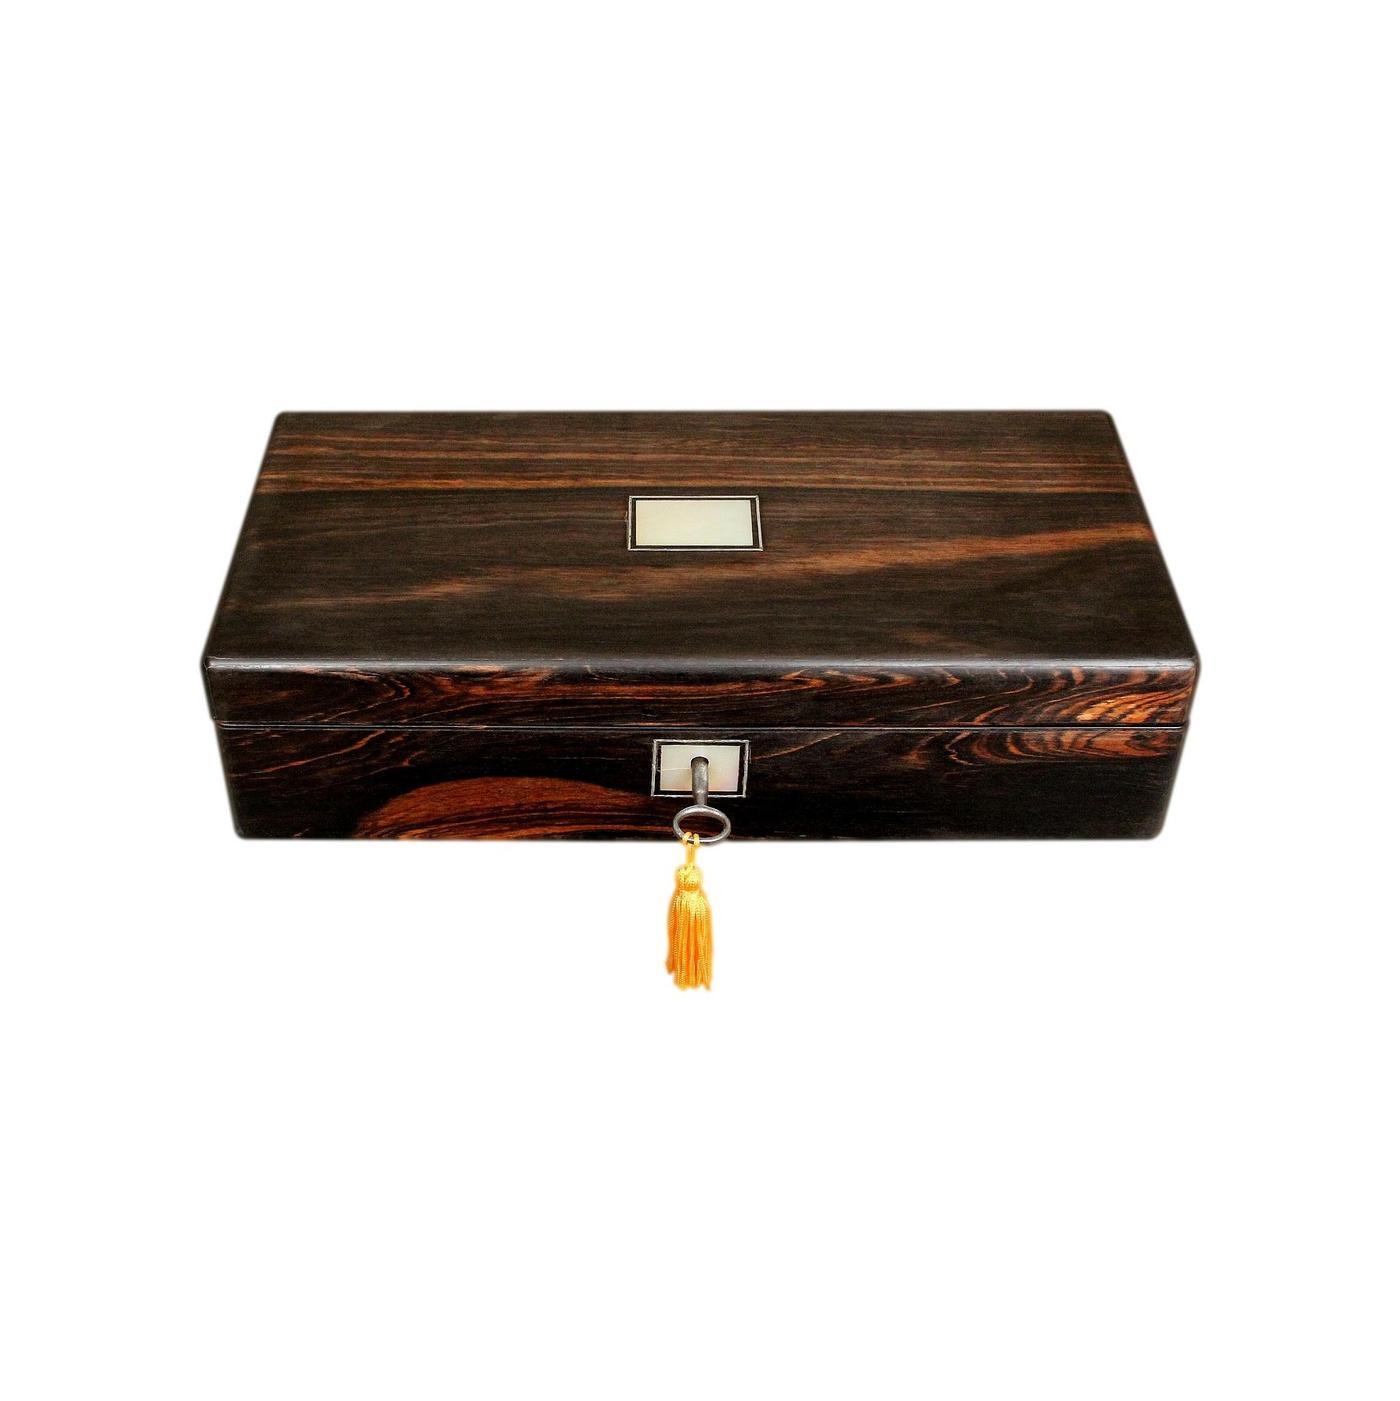 Superb Refurbished Antique Victorian Coromandel Jewellery Box